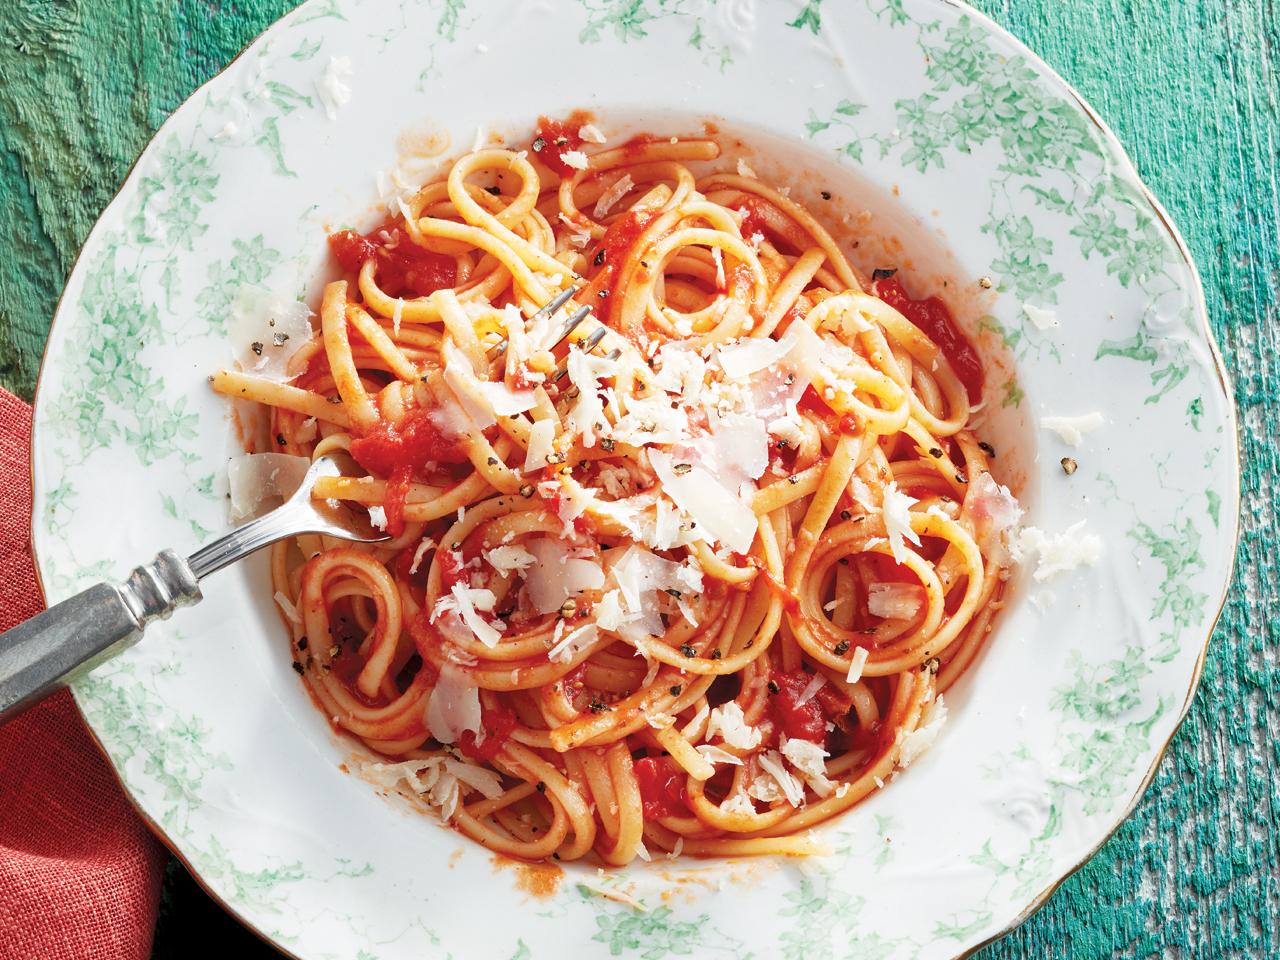 Classic tomato sauce